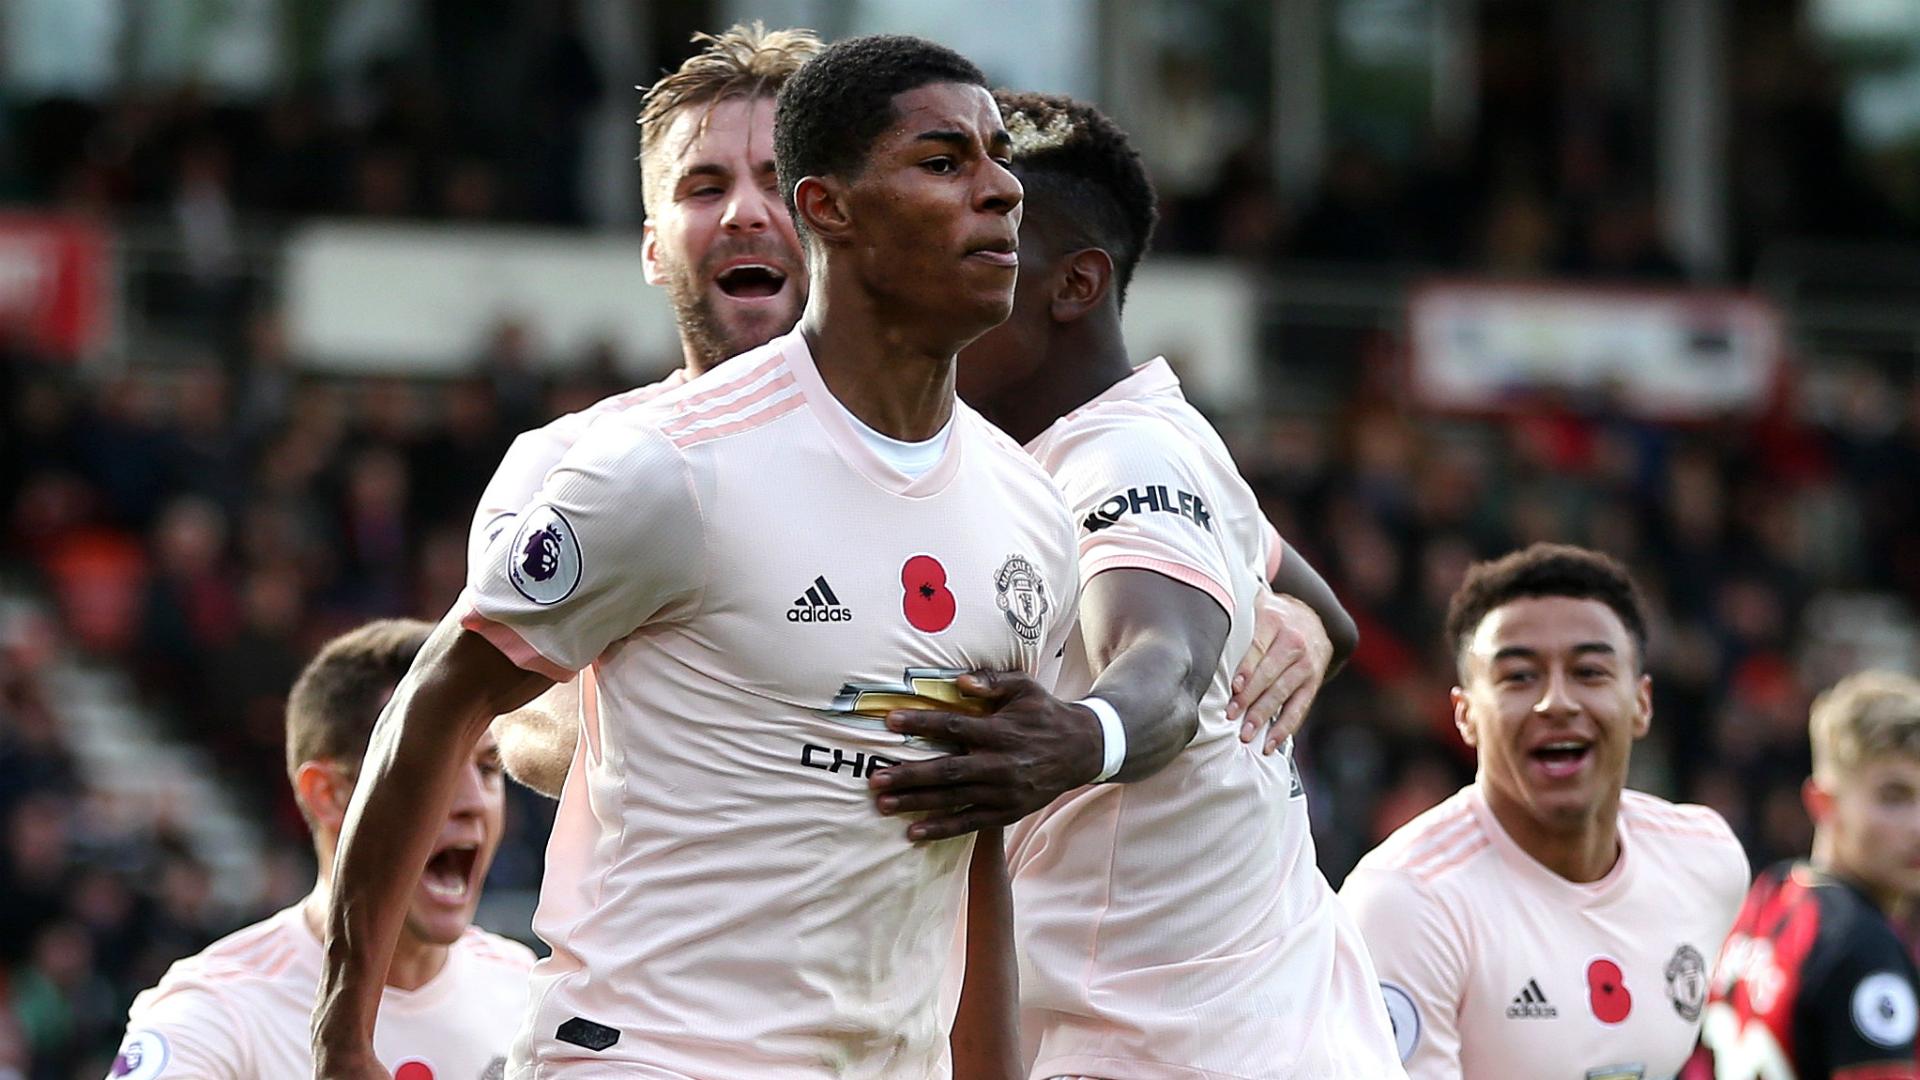 Liverpool V Manchester United Resurgent Rashford Now A